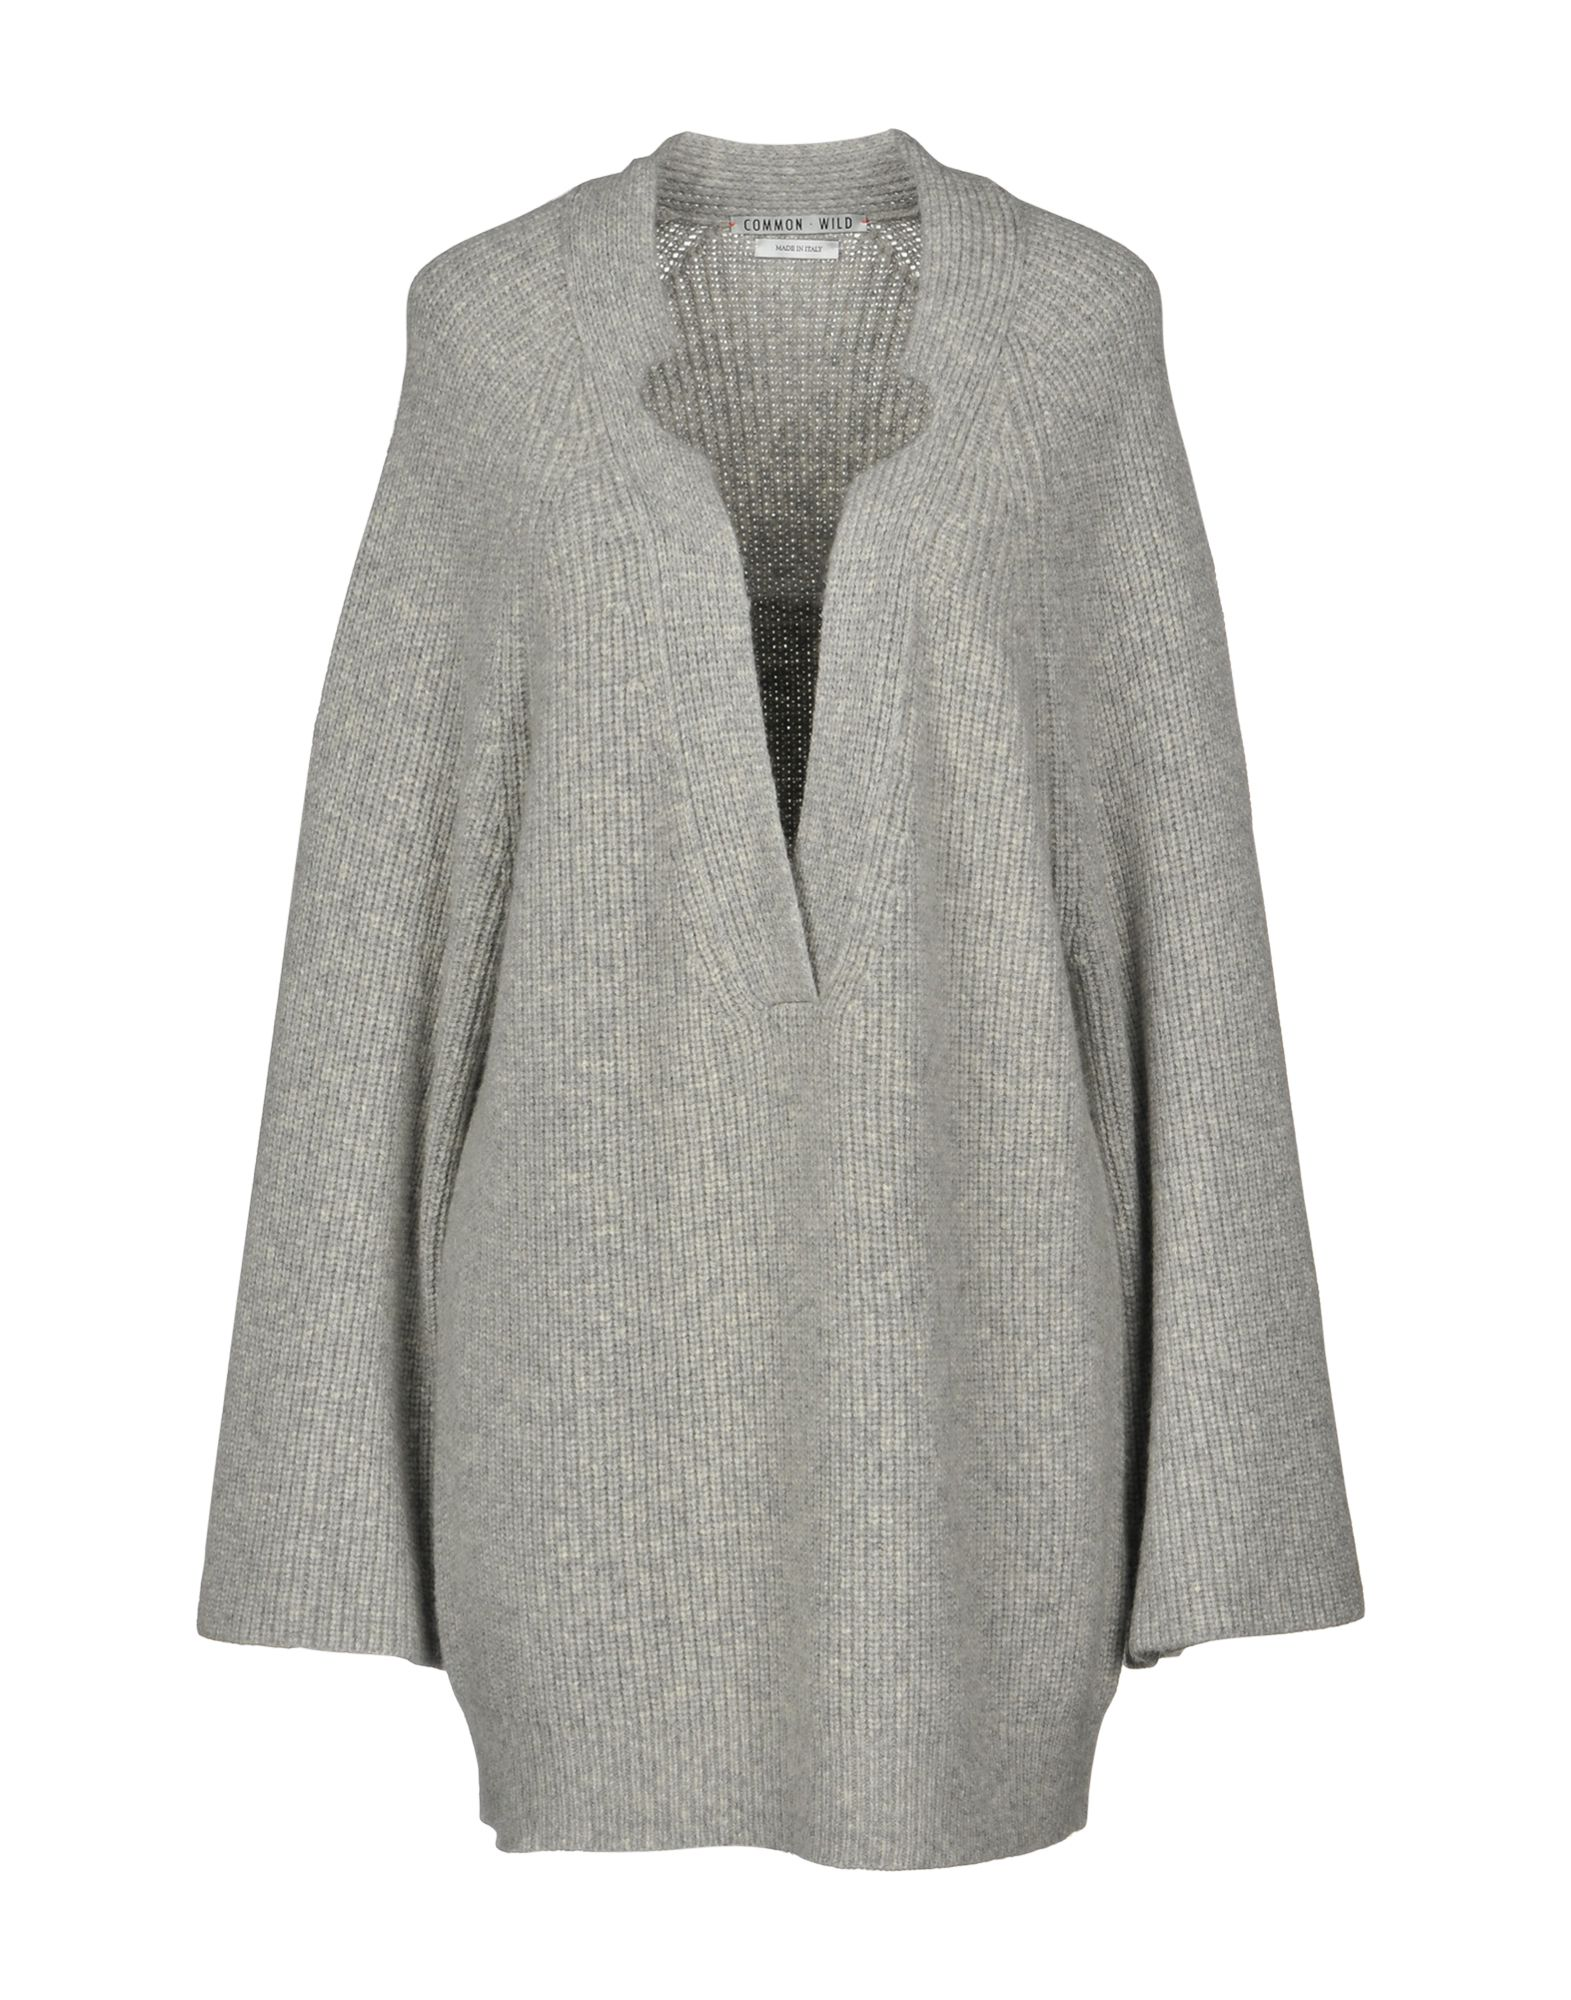 COMMON WILD Sweater in Light Grey